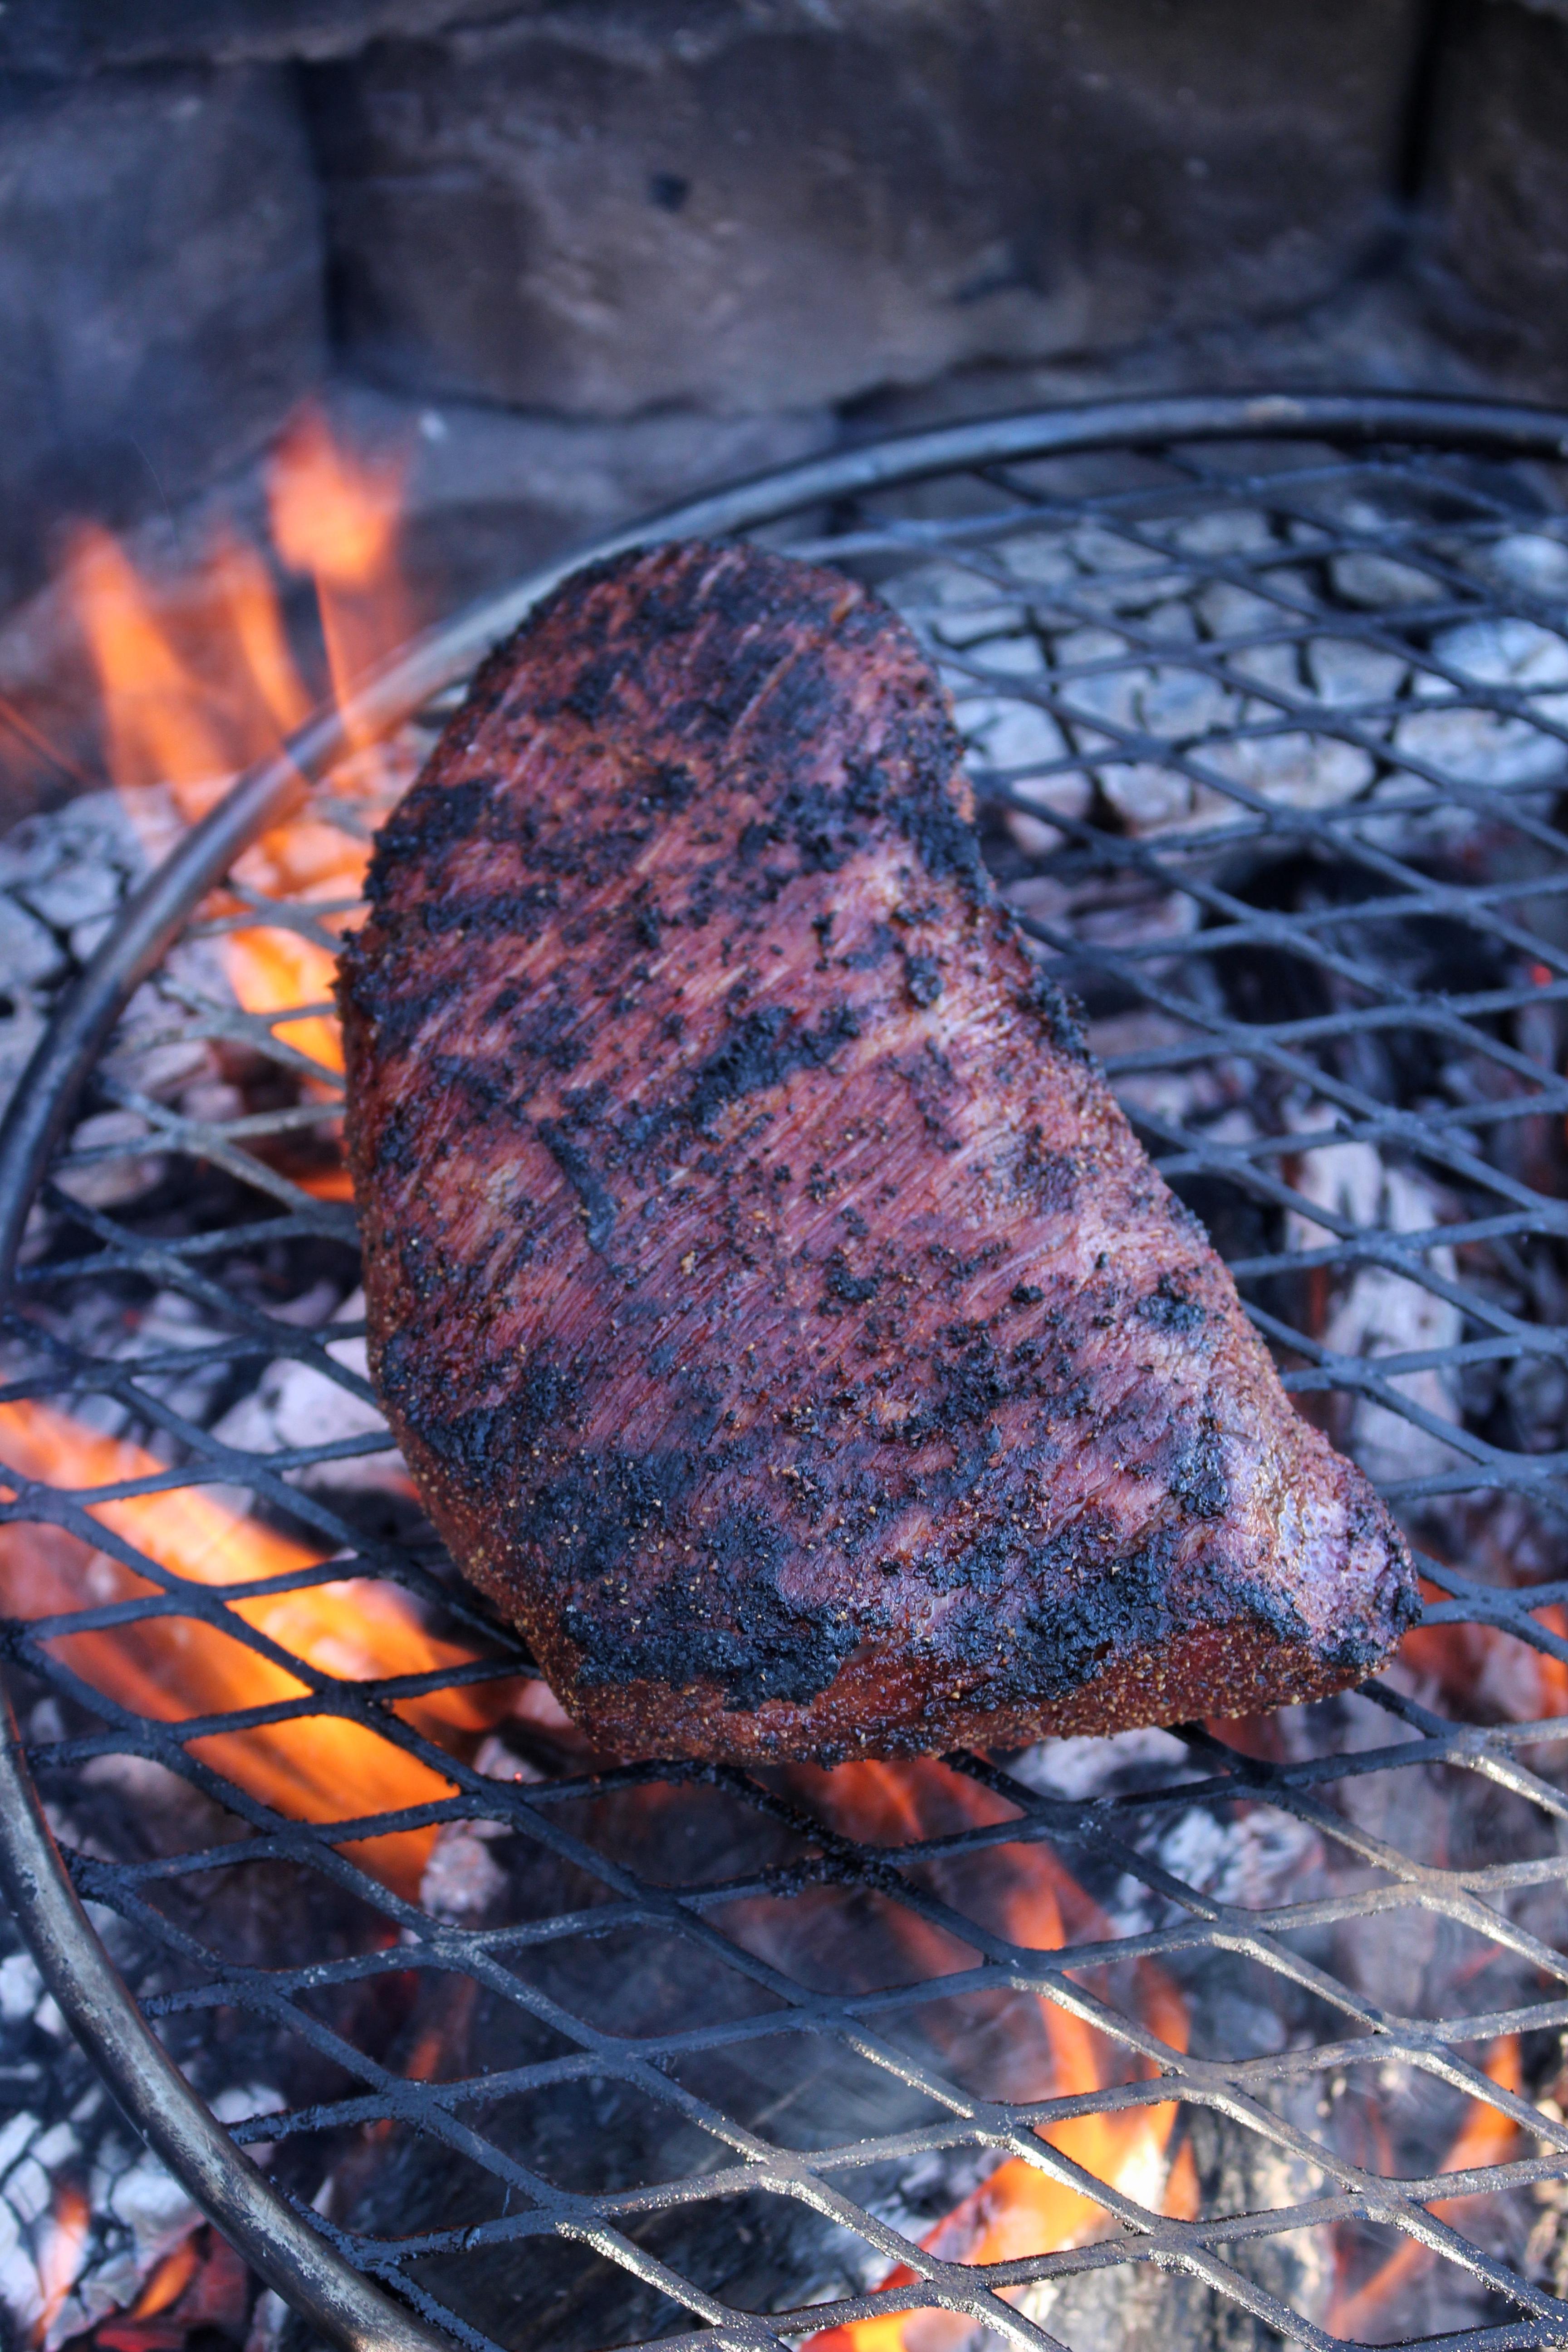 chili smoked chipotle steak